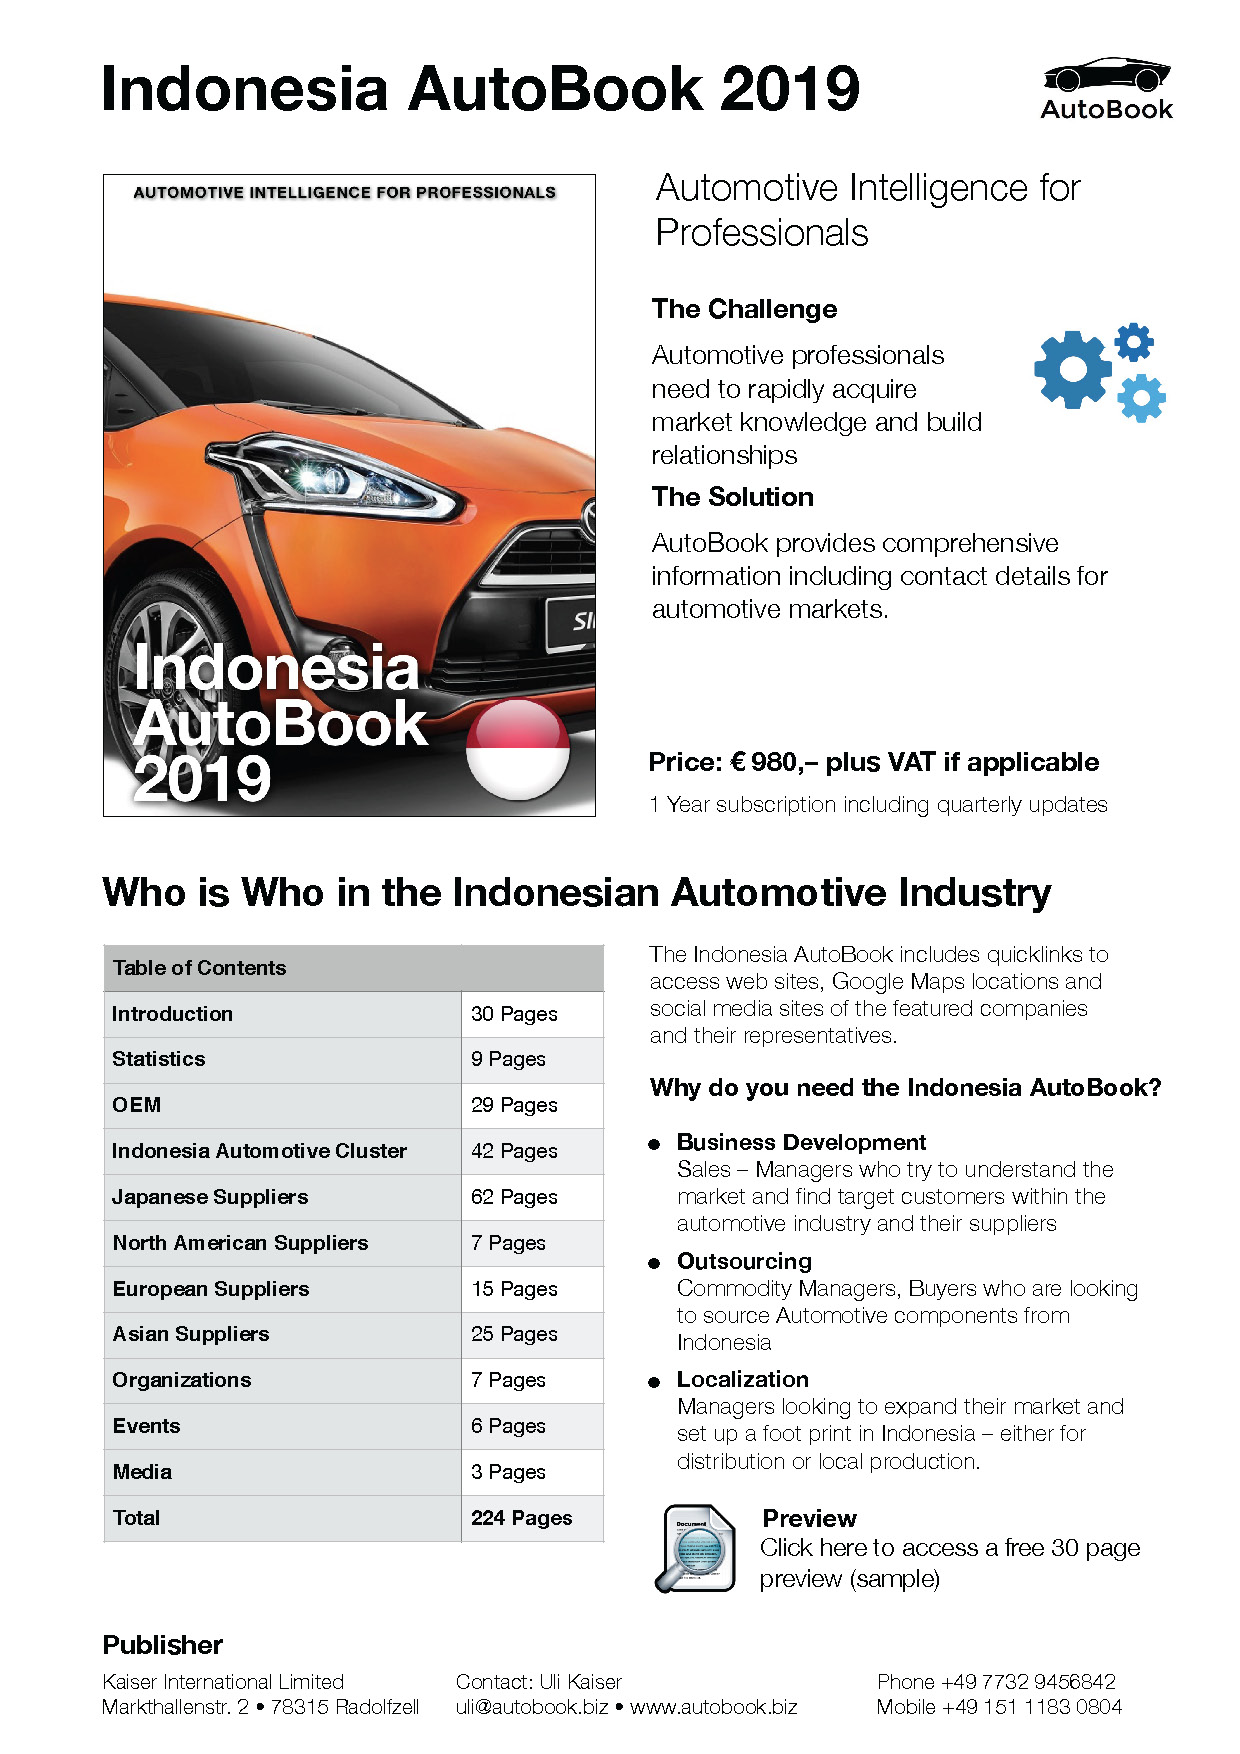 Indonesia AutoBook 2019 Datasheet.jpg